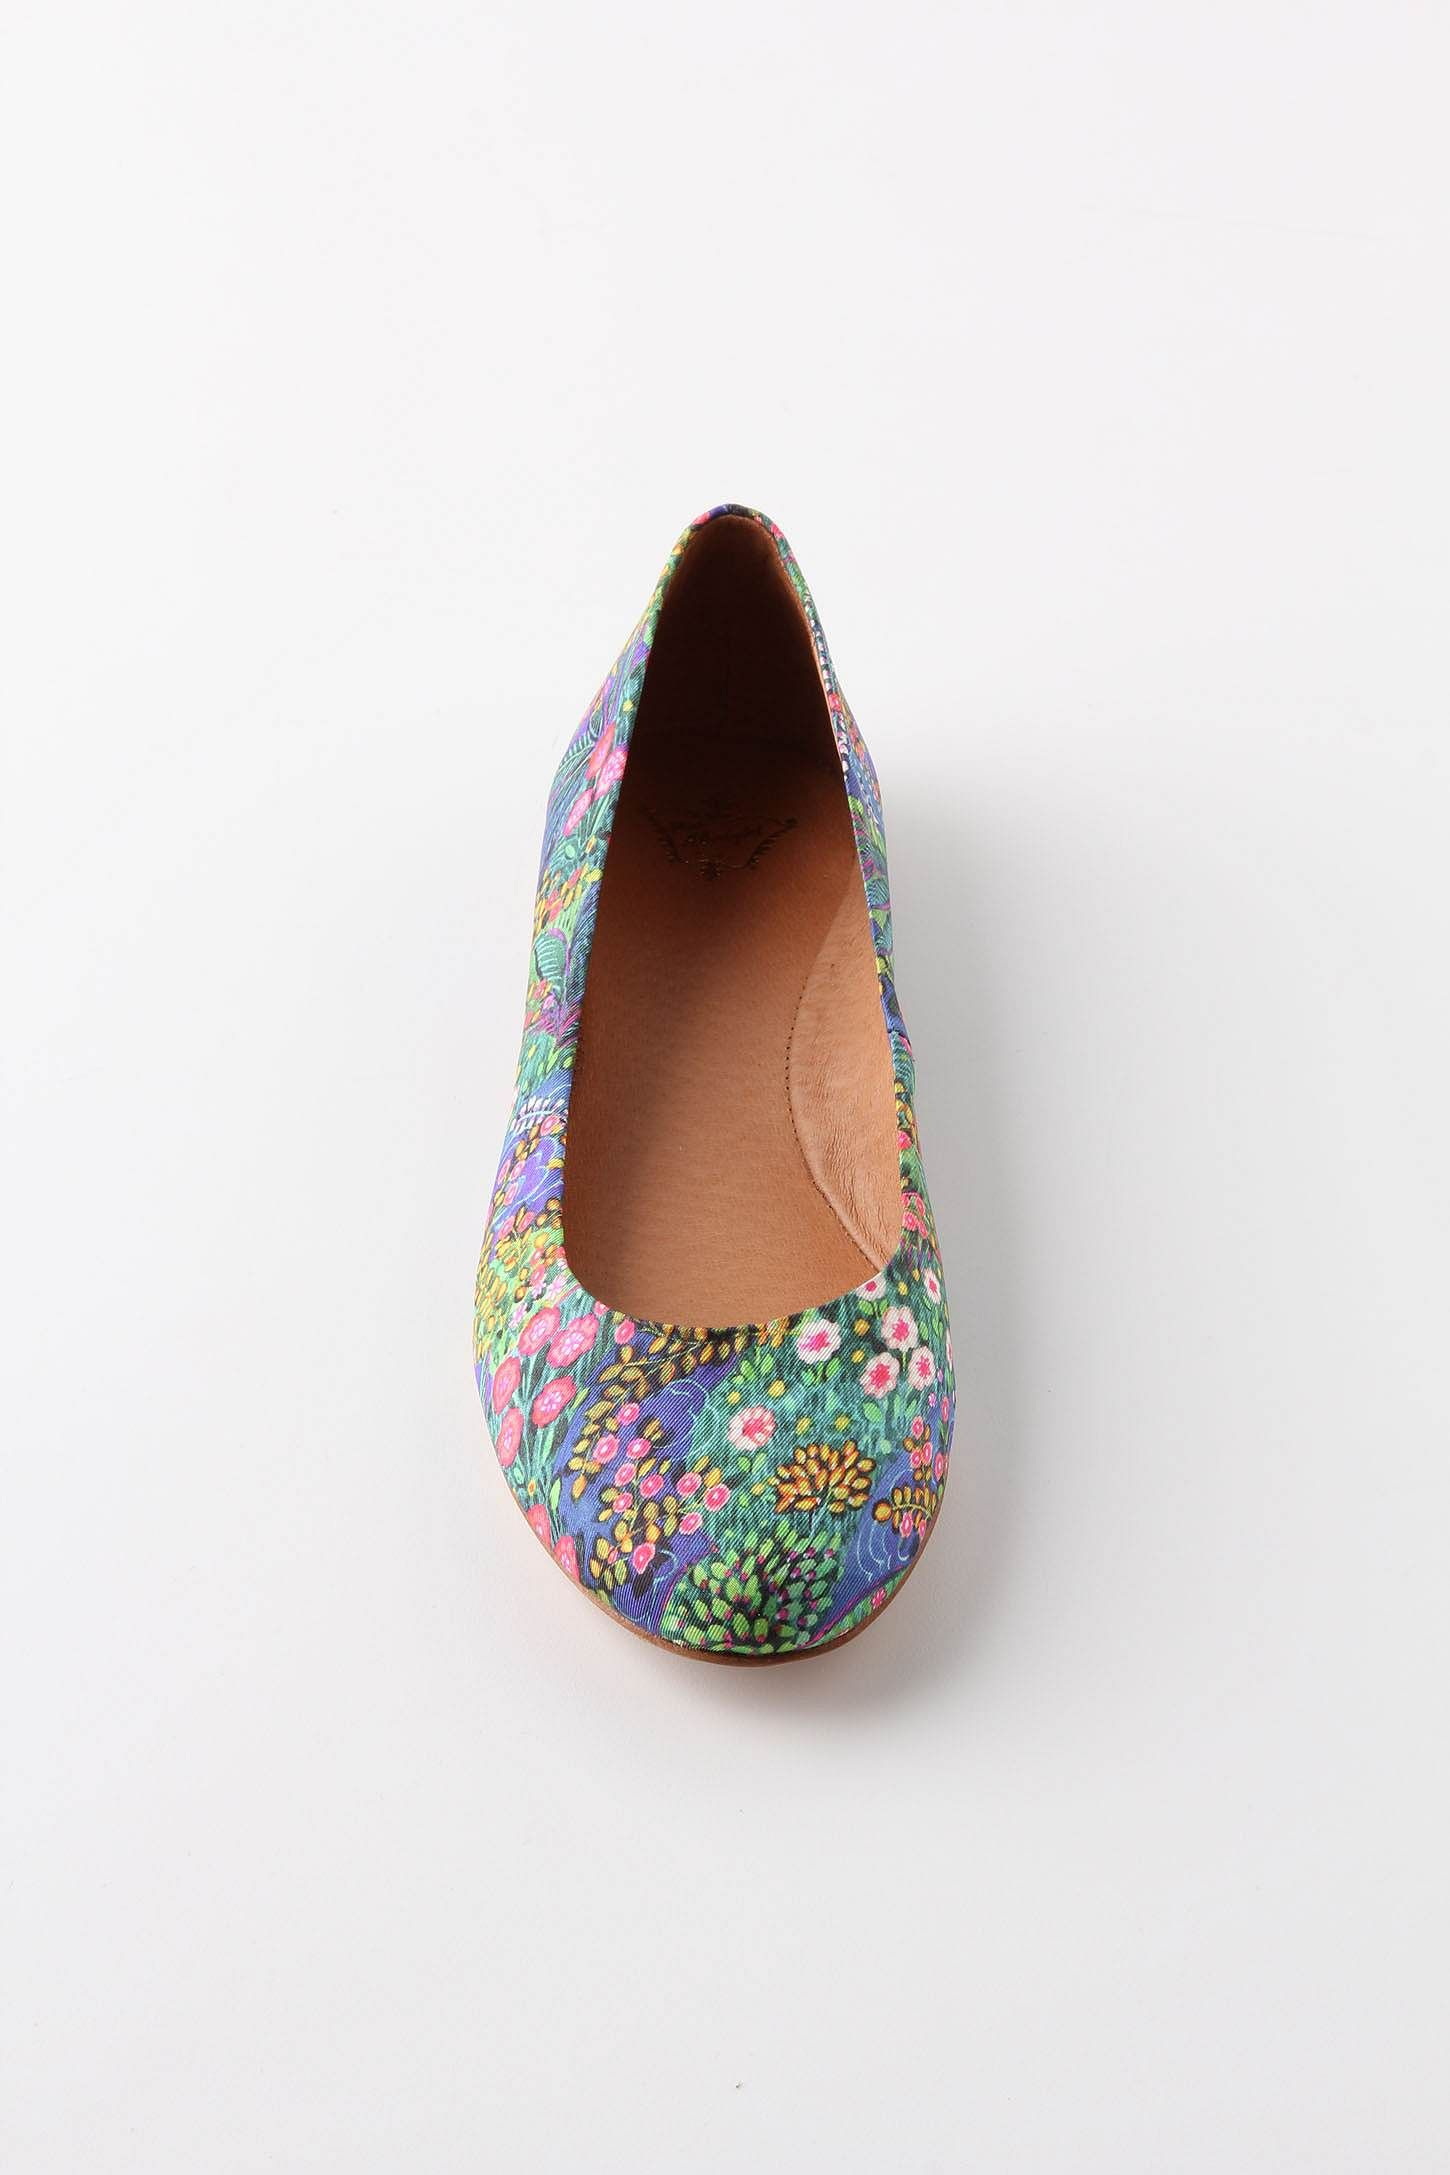 Gardella En Shoes Lucía De Pin tQrshxCd